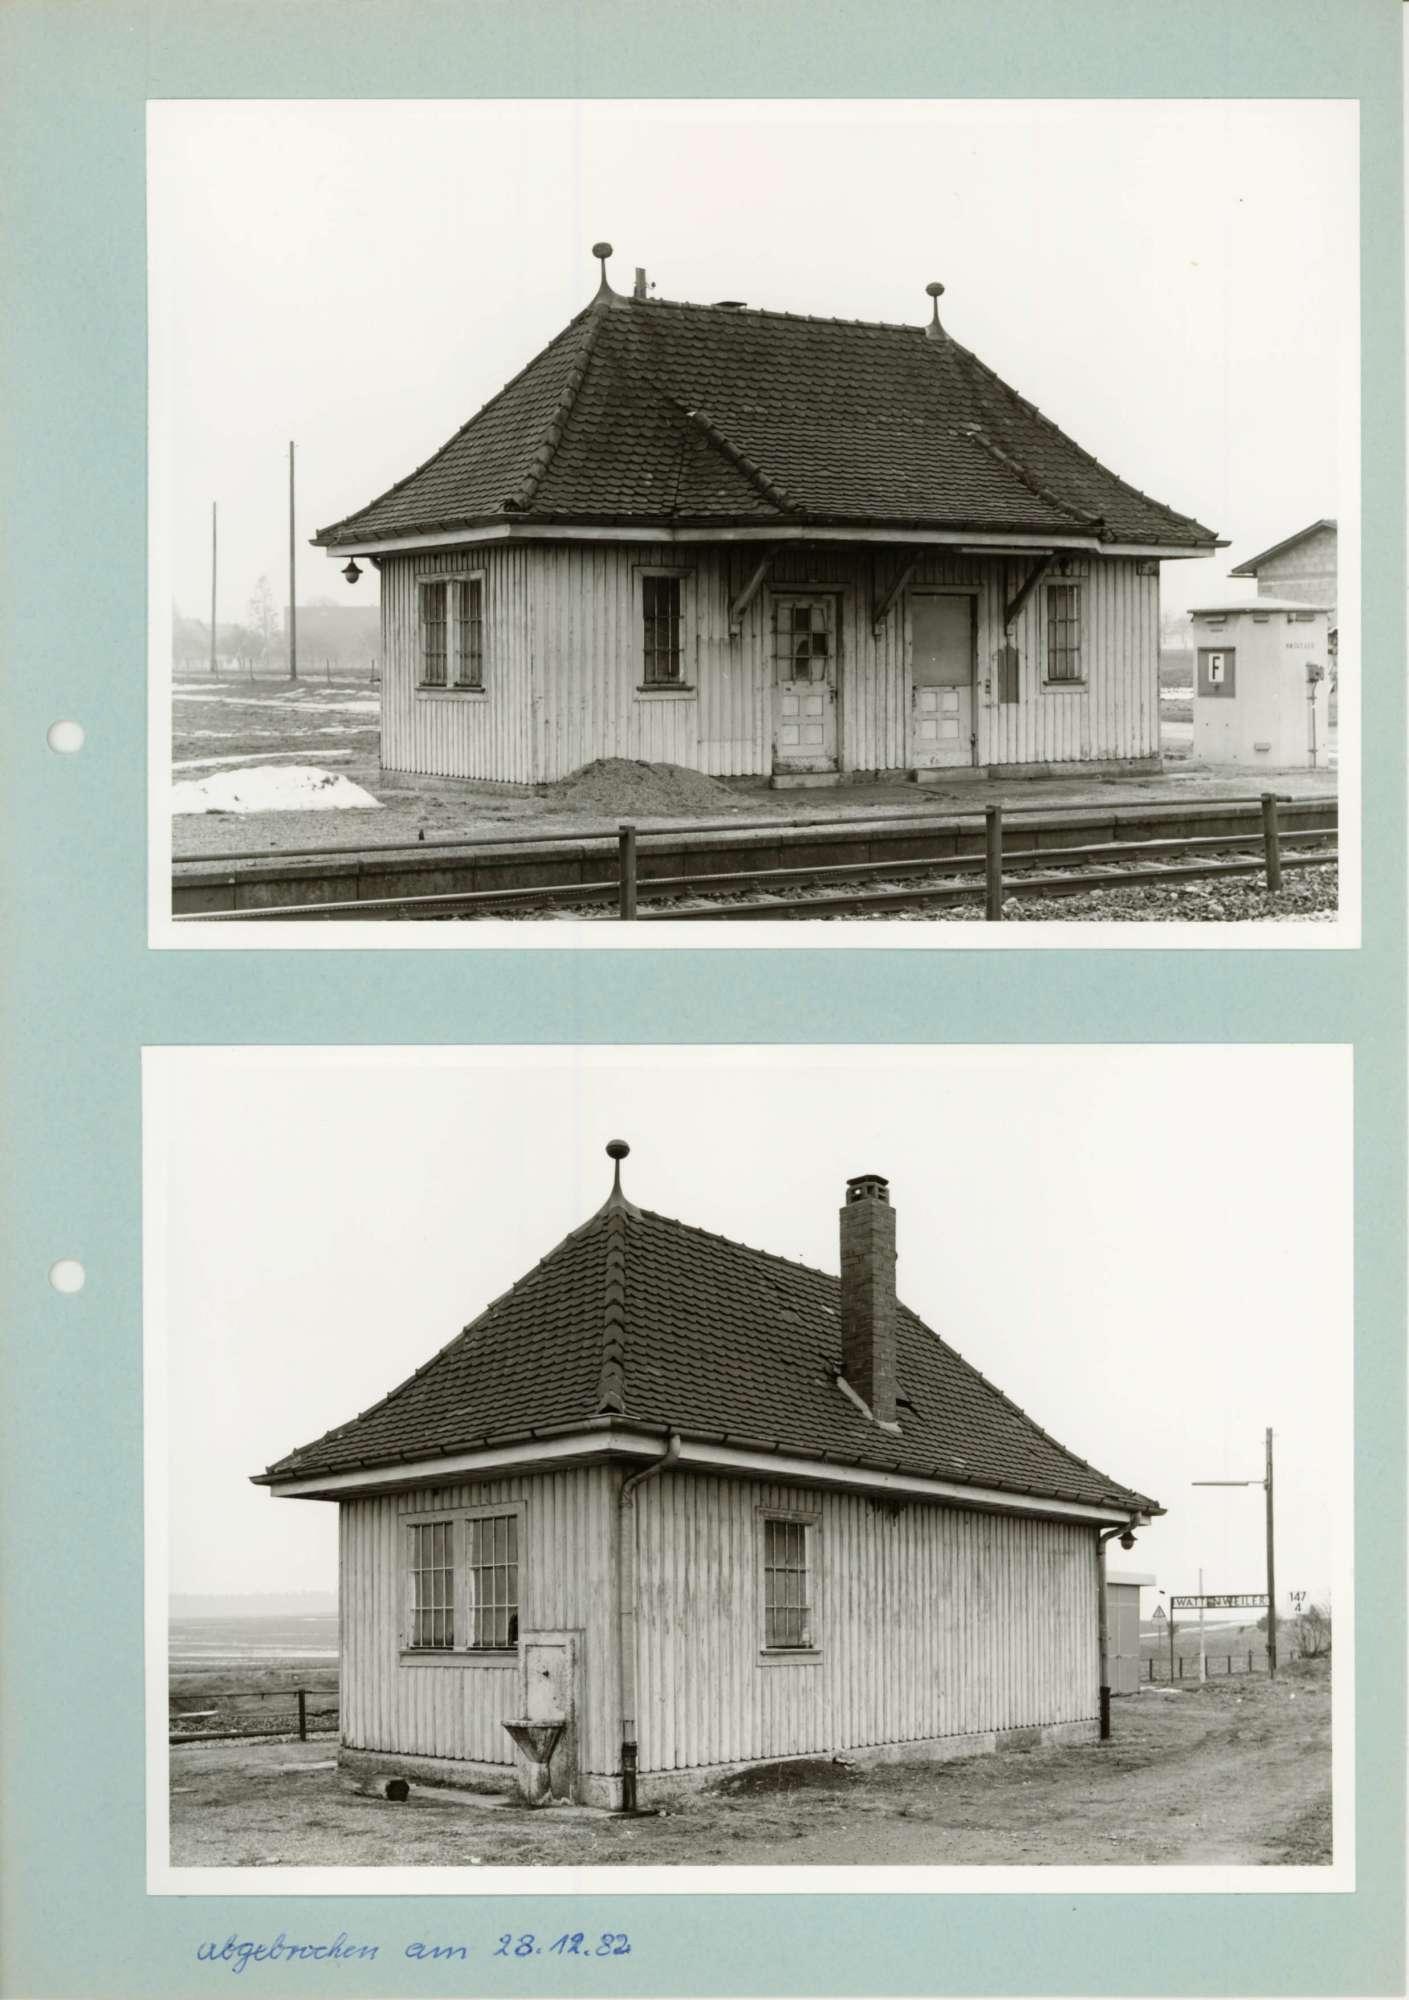 Wattenweiler: 2 Fotos, Bild 1